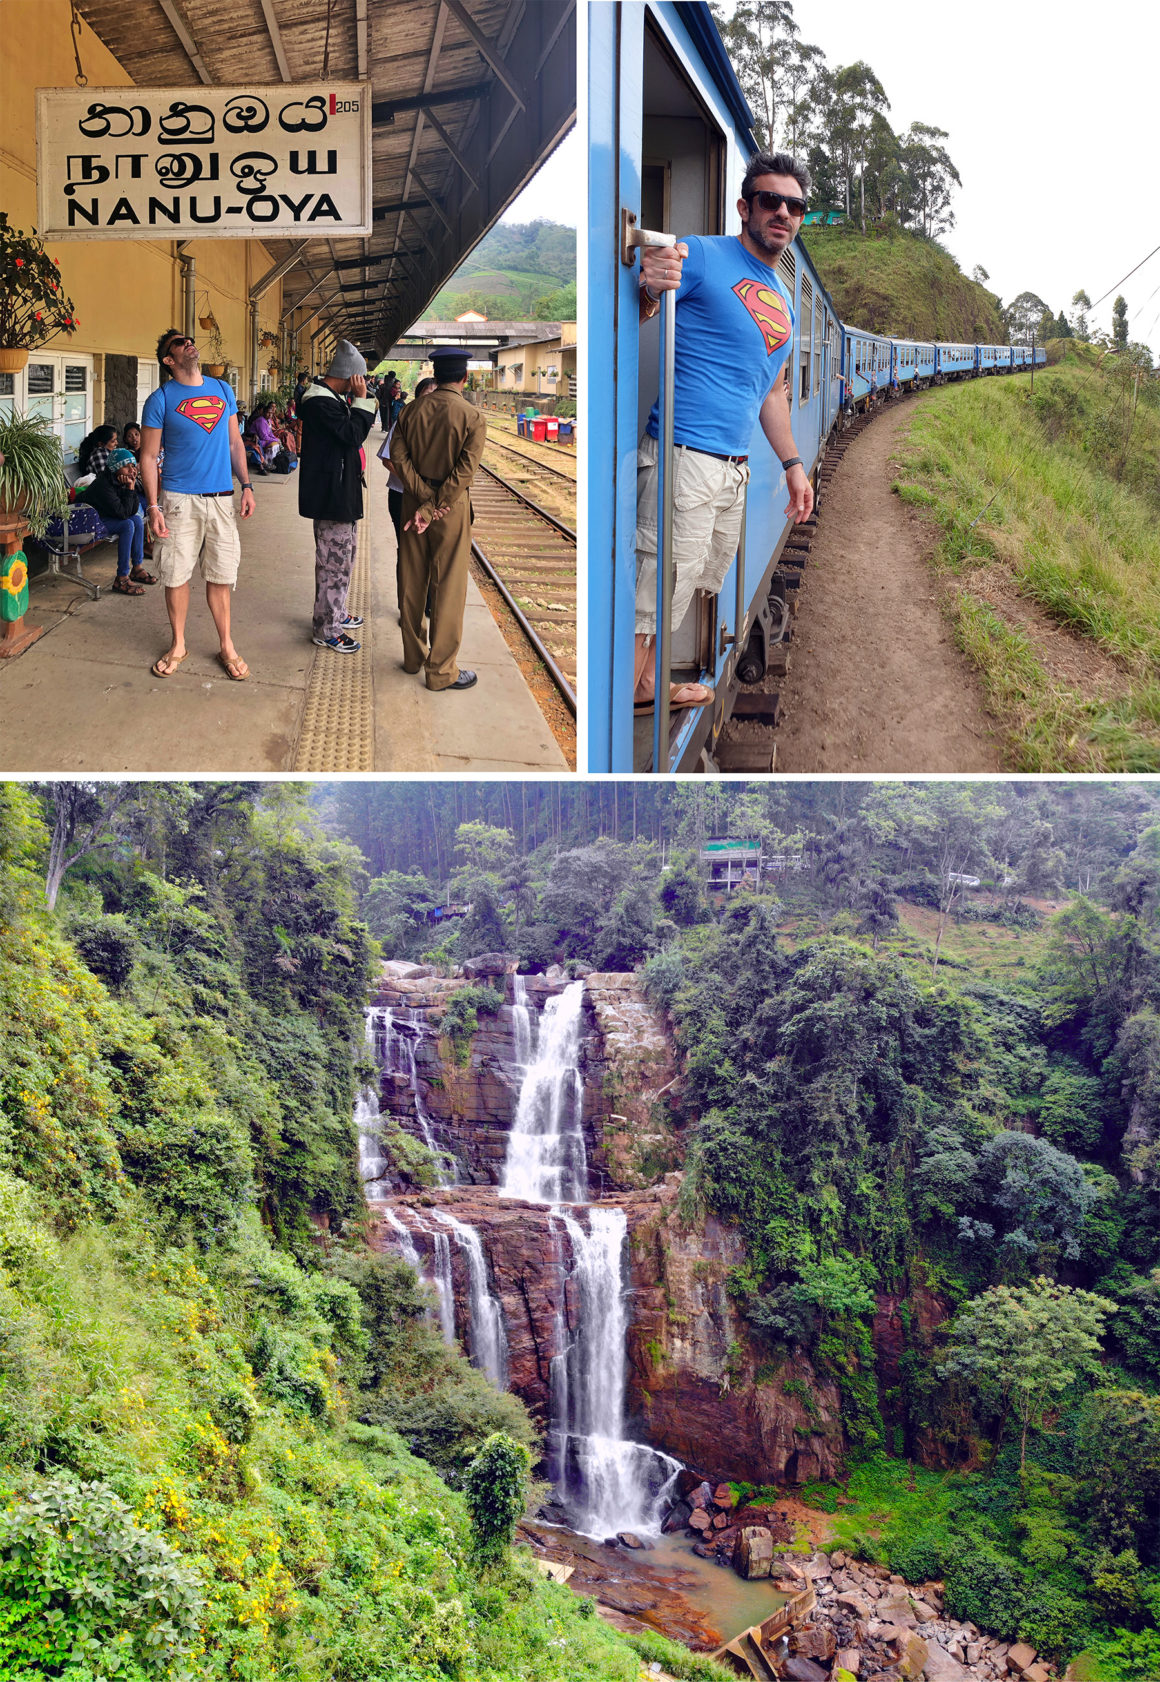 ruta por Sri Lanka en 8 días ruta por sri lanka en 8 días - thewotme nanu oya nuwara eliya tren de ella kandy 1160x1682 - Nuestra ruta por Sri Lanka en 8 días, diario de viaje